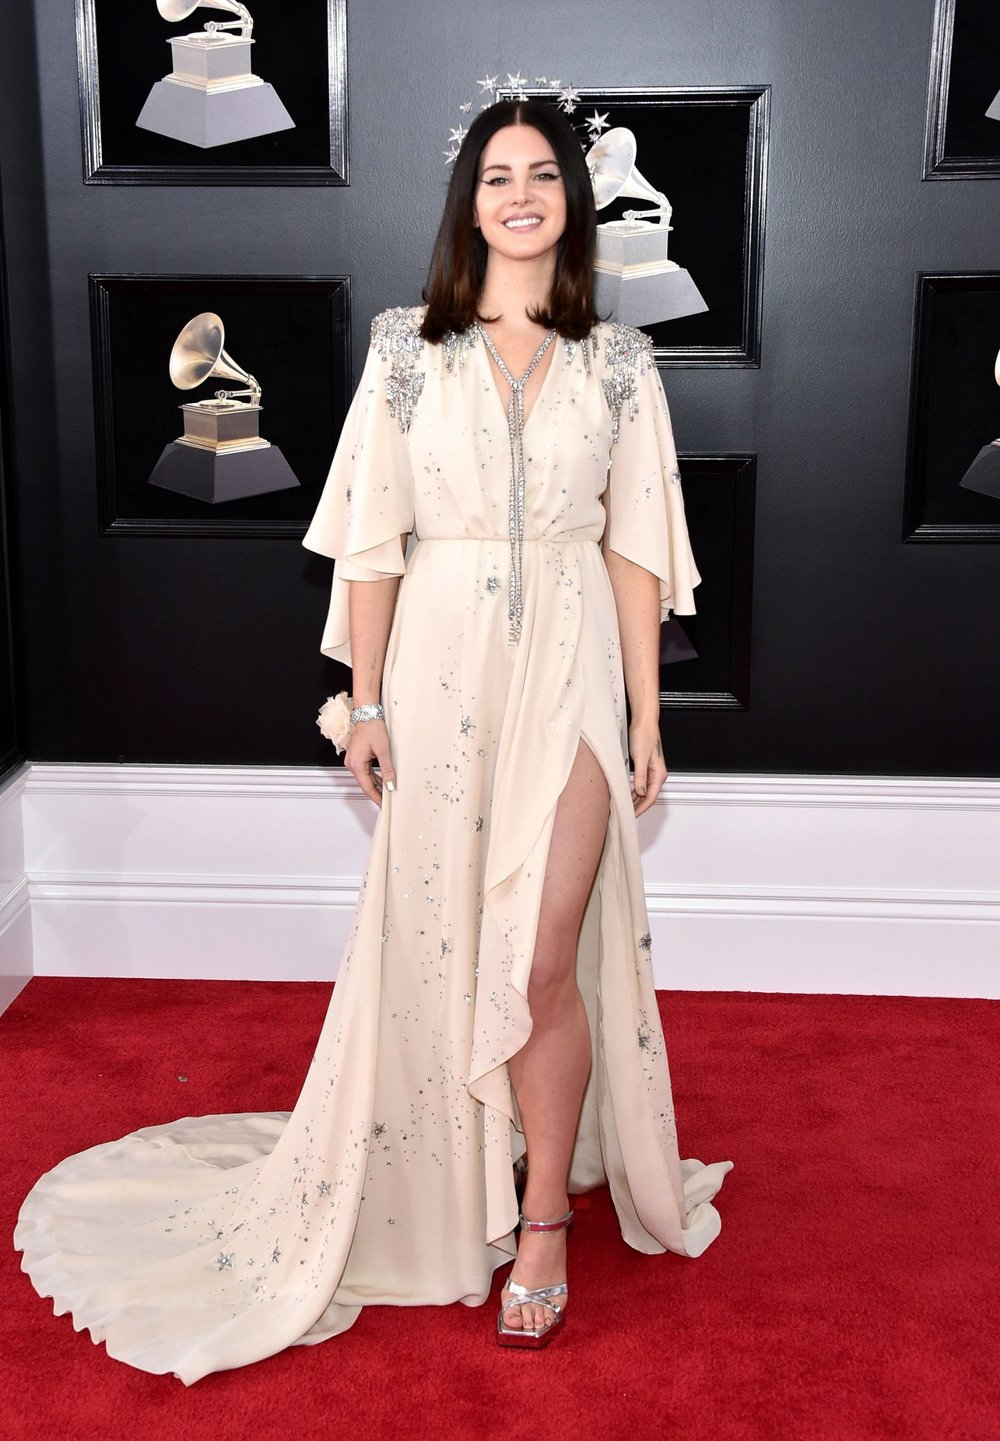 Grammys Awards 2018 - Lana Del Rey in Gucci.jpg